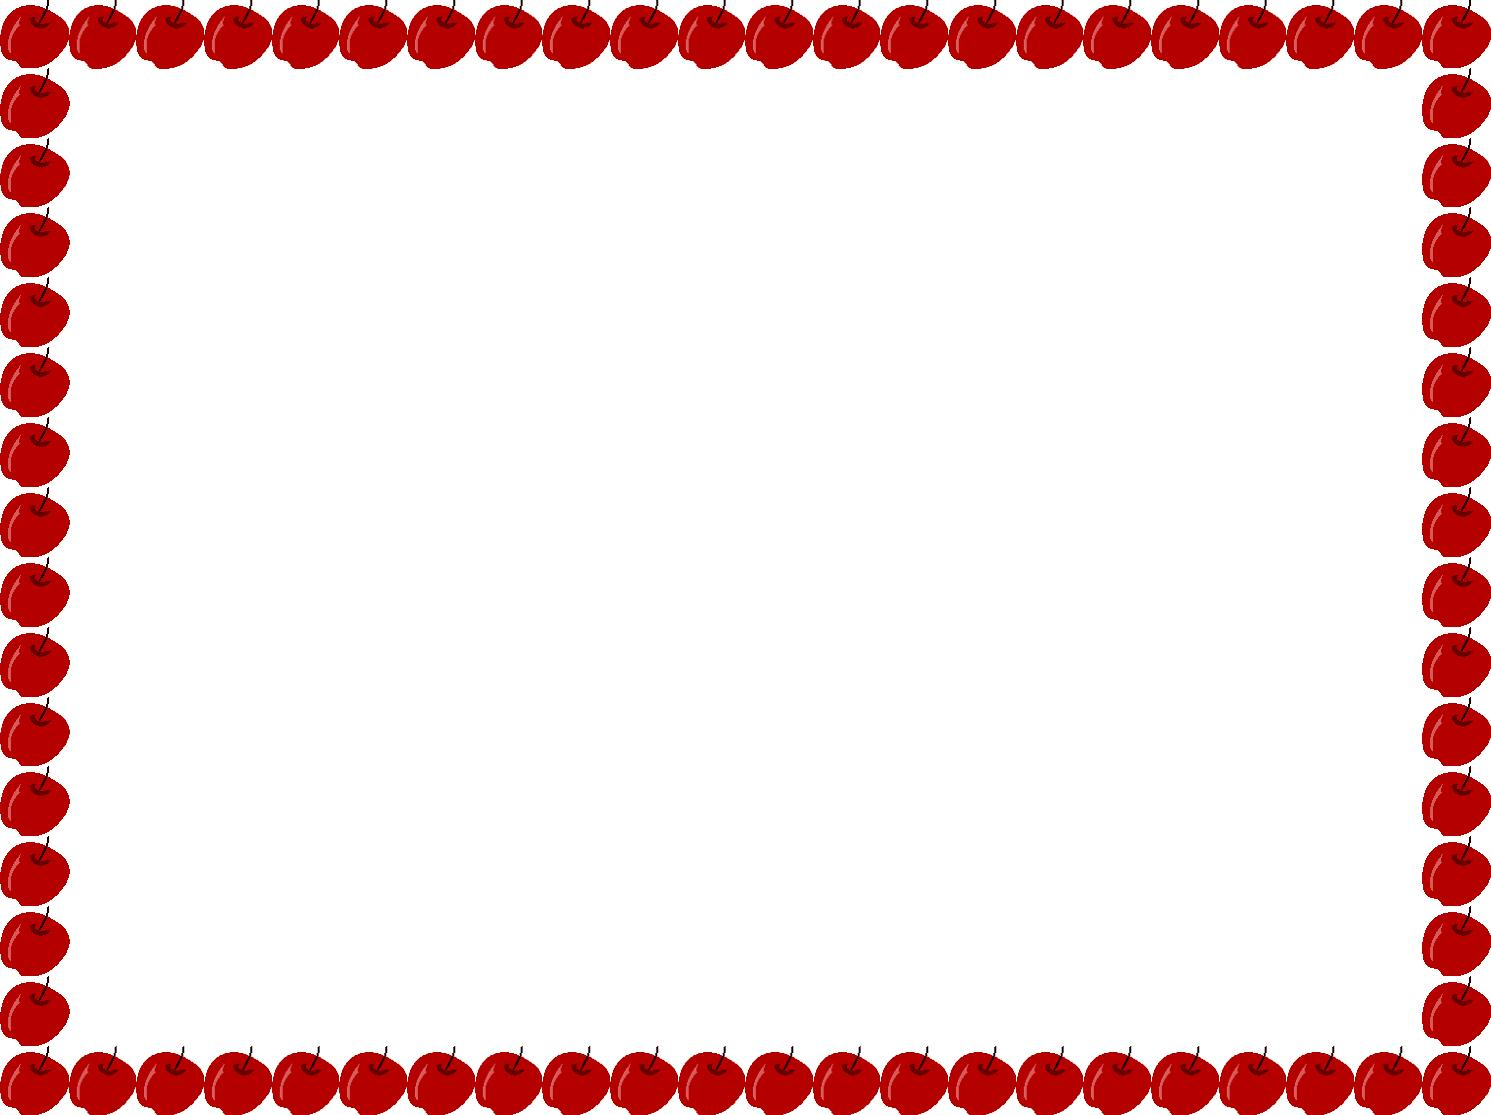 Apple clipart borders. Free download clip art